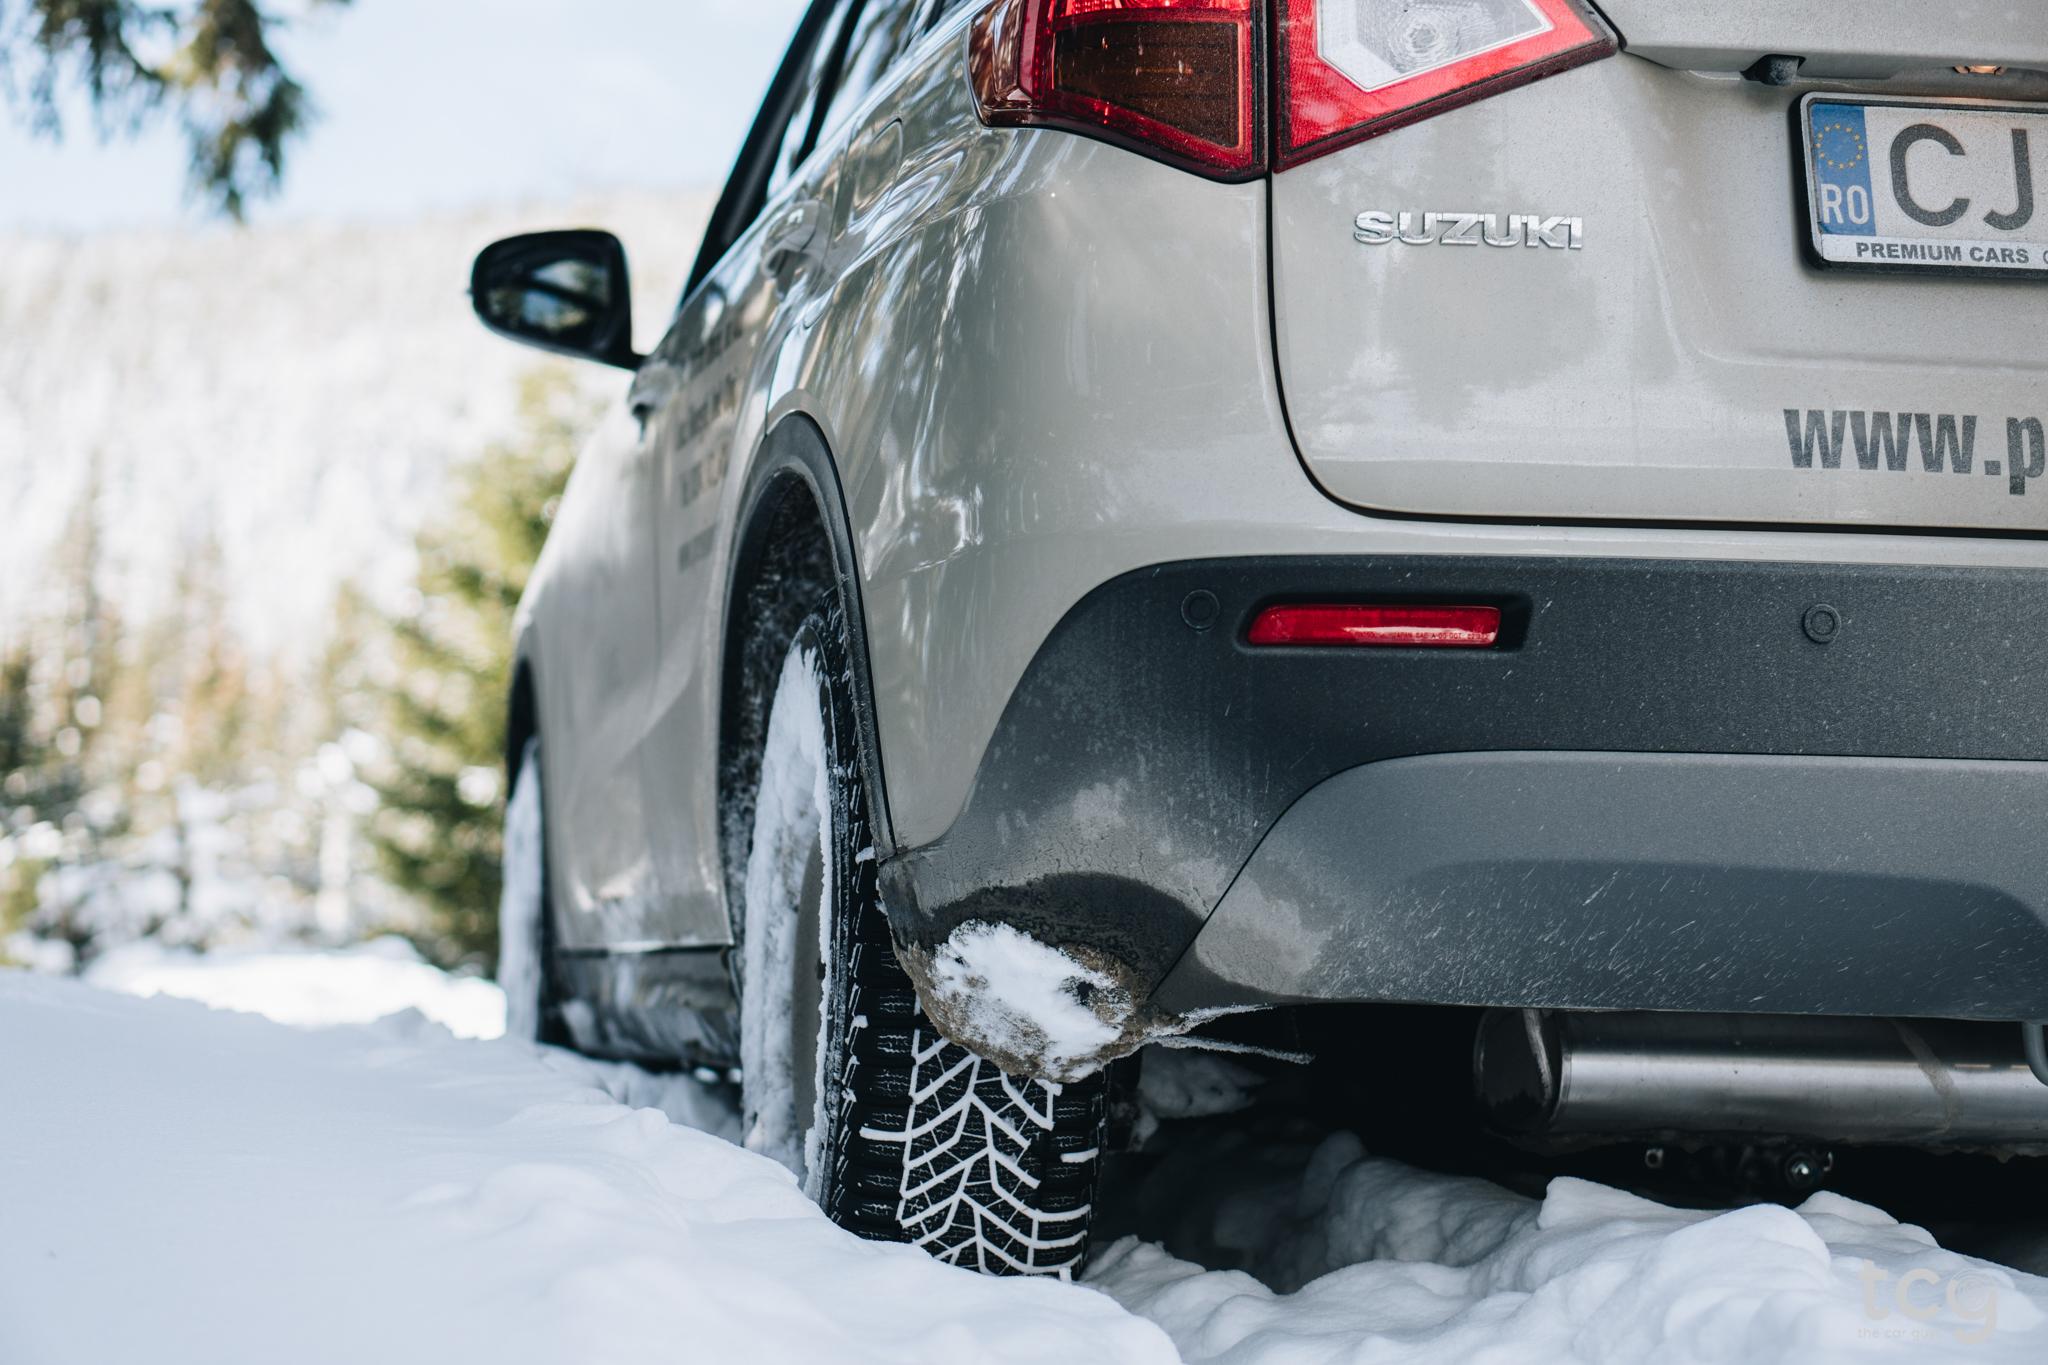 Suzuki Vitara - A worthy competitor!